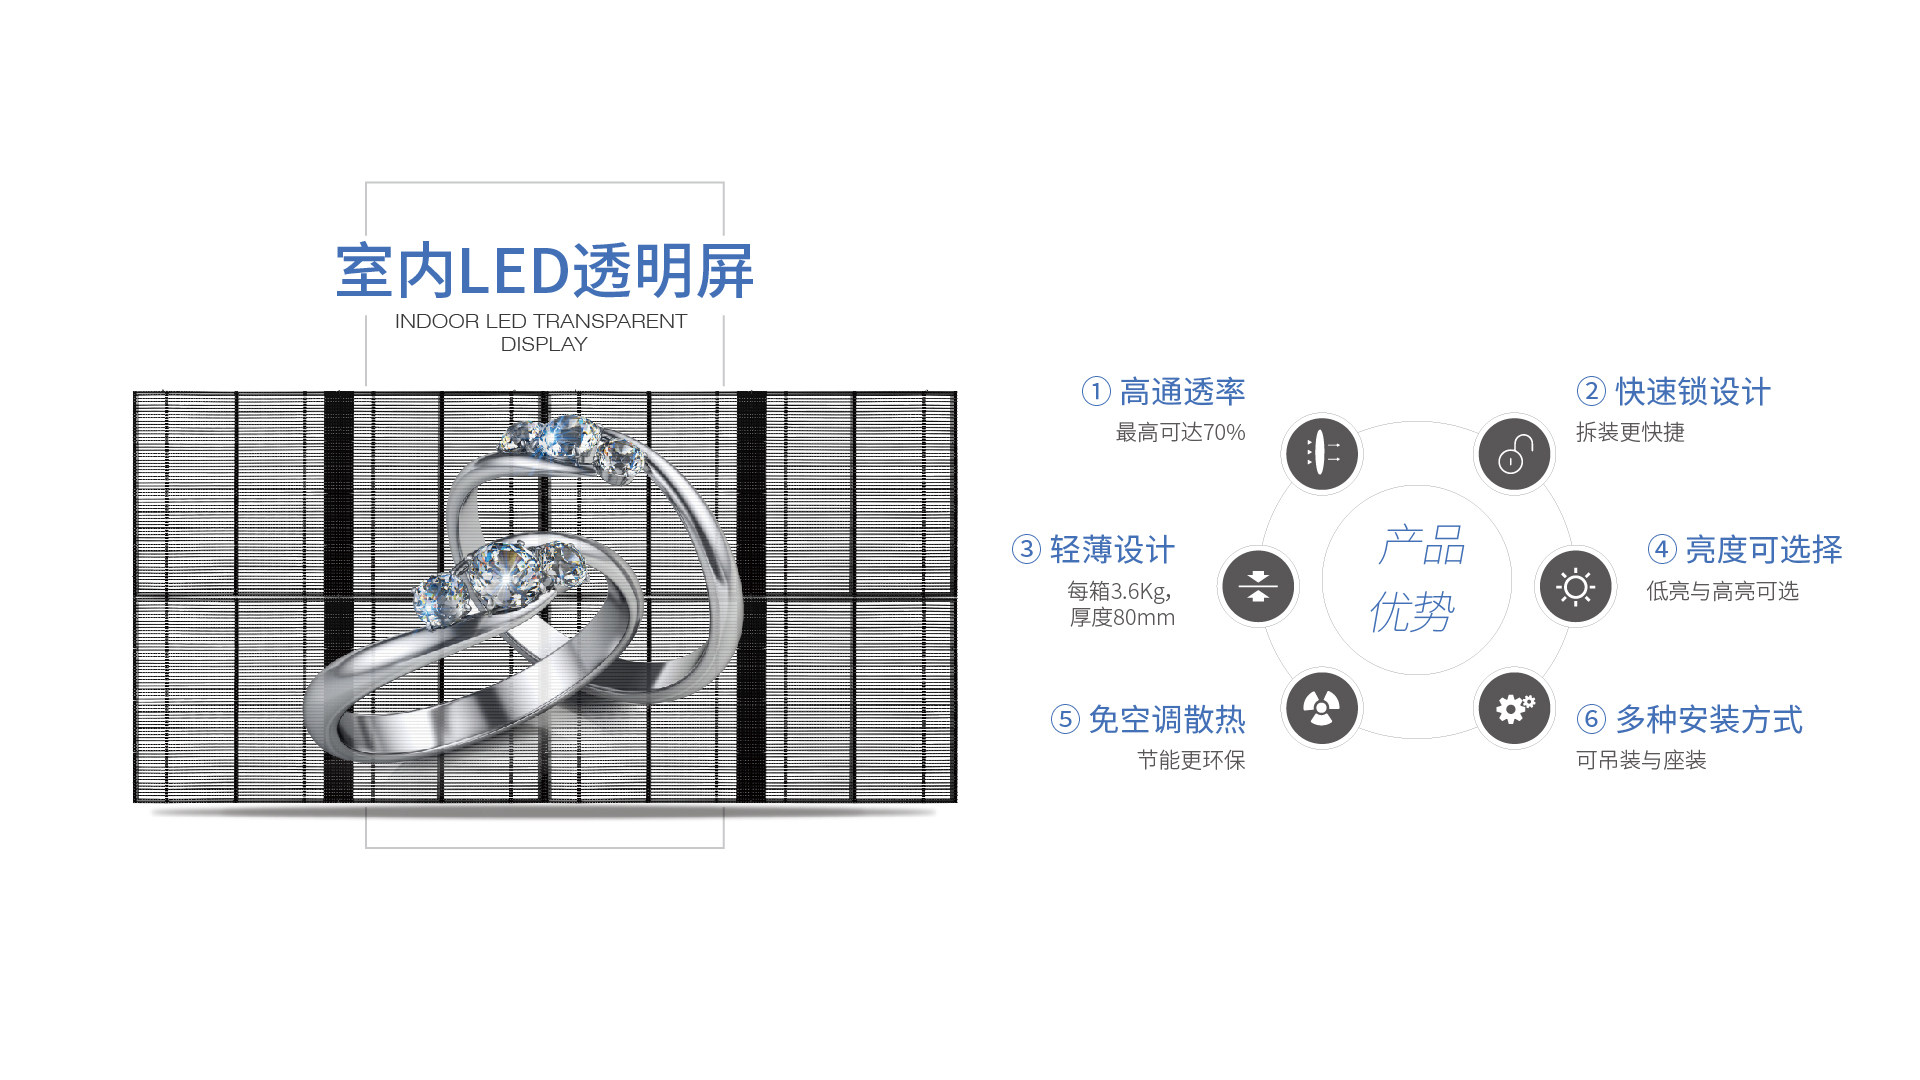 LED透明屏闪烁的6大原因及解决方法!